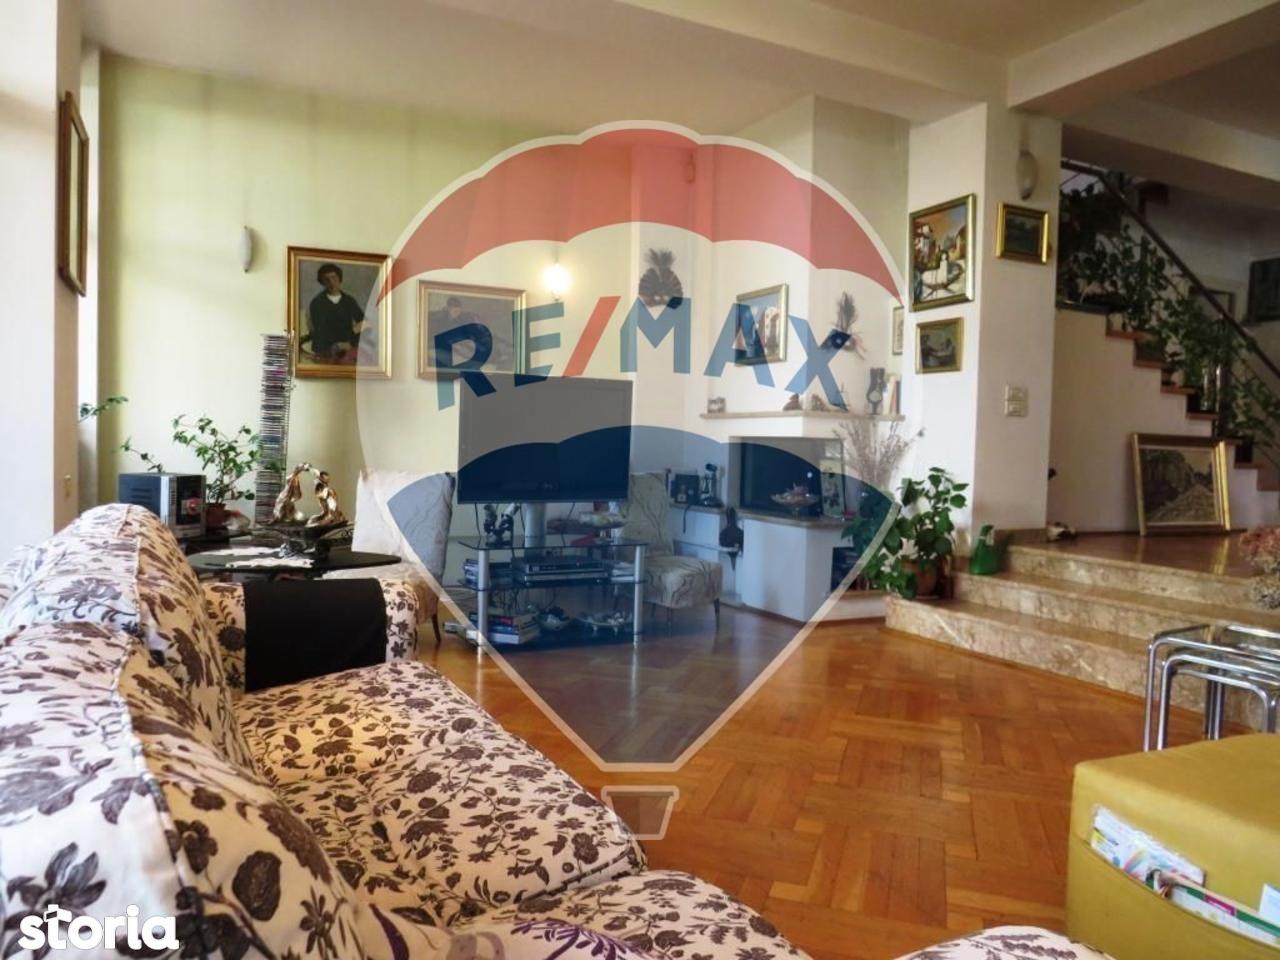 Casa de vanzare, București (judet), Strada Inginer Dumitru Zosima - Foto 1